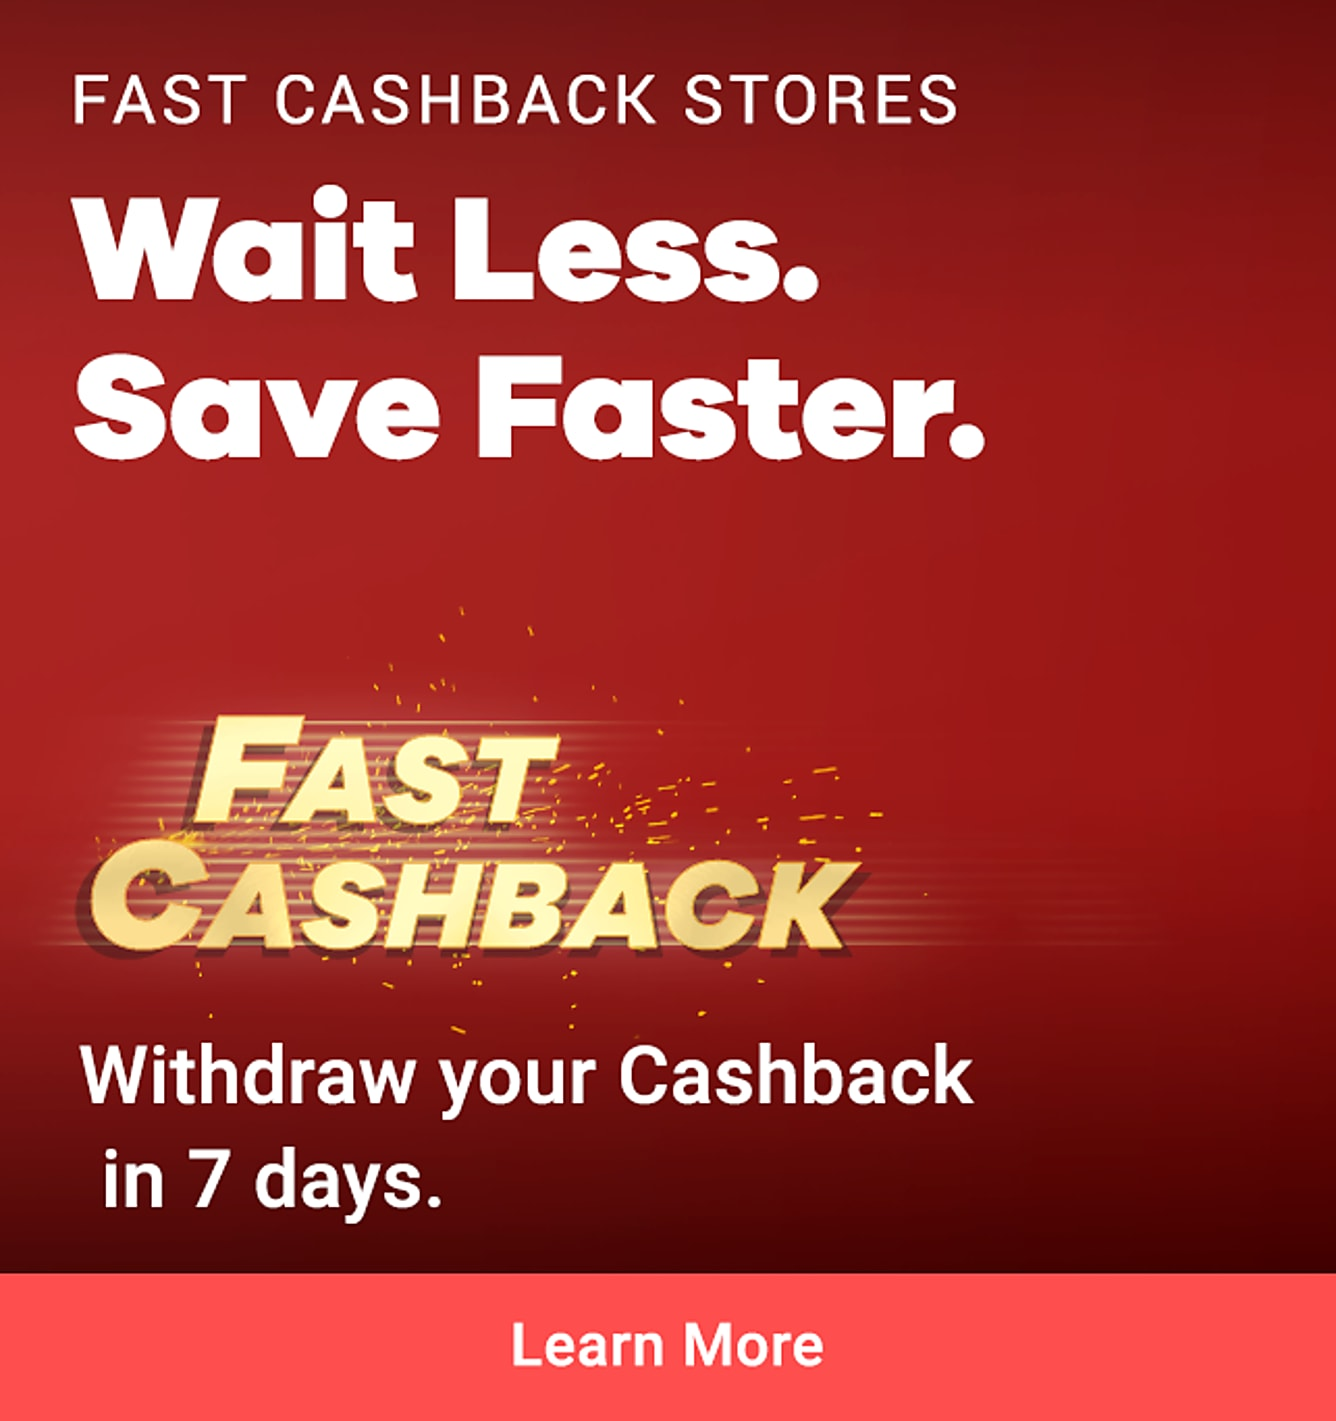 Fast Cashback: Guardian, Sephora, Qoo10, Charles & Keith (1 week claim time)